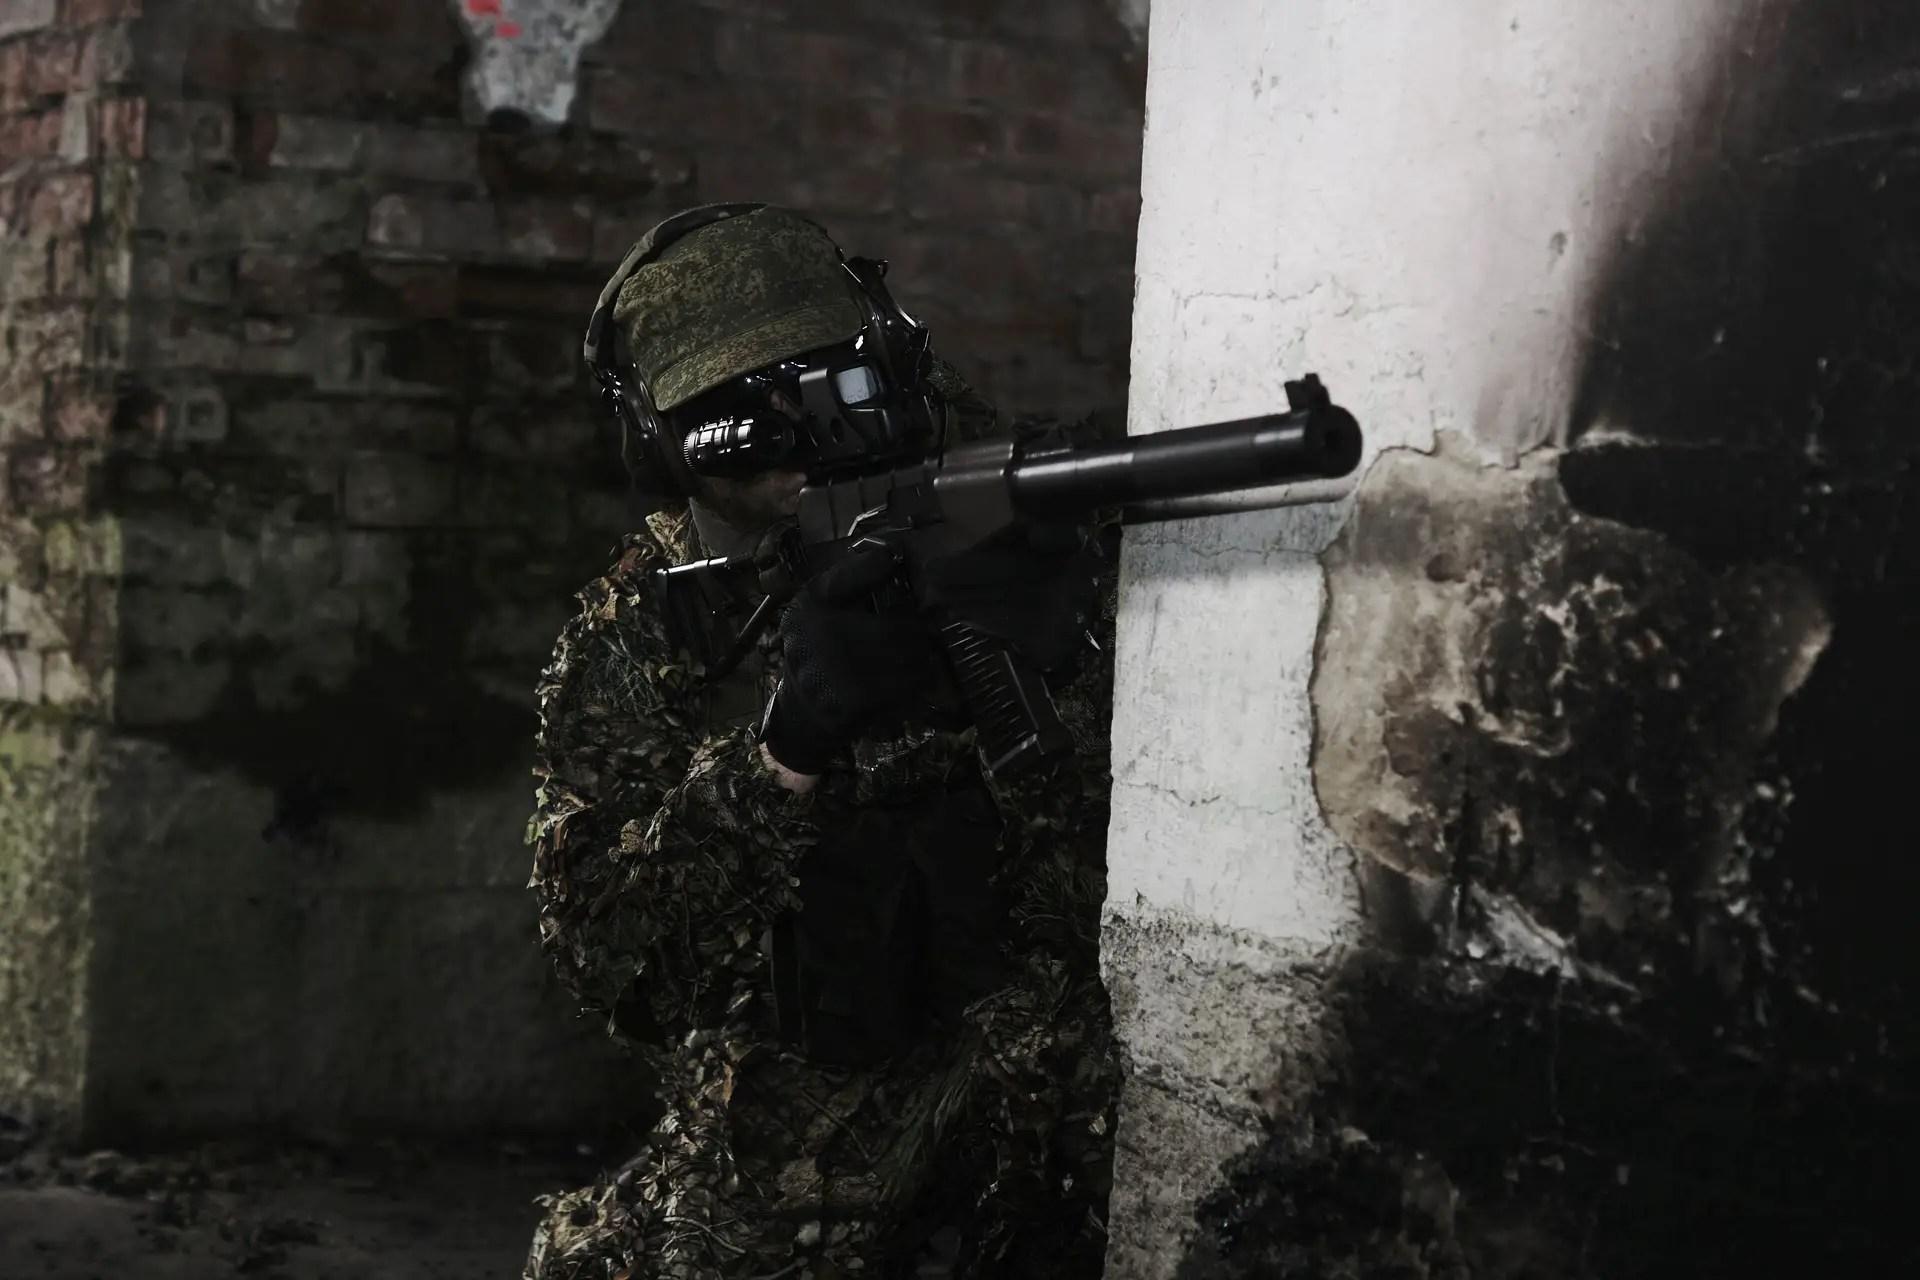 rifle scope under 300